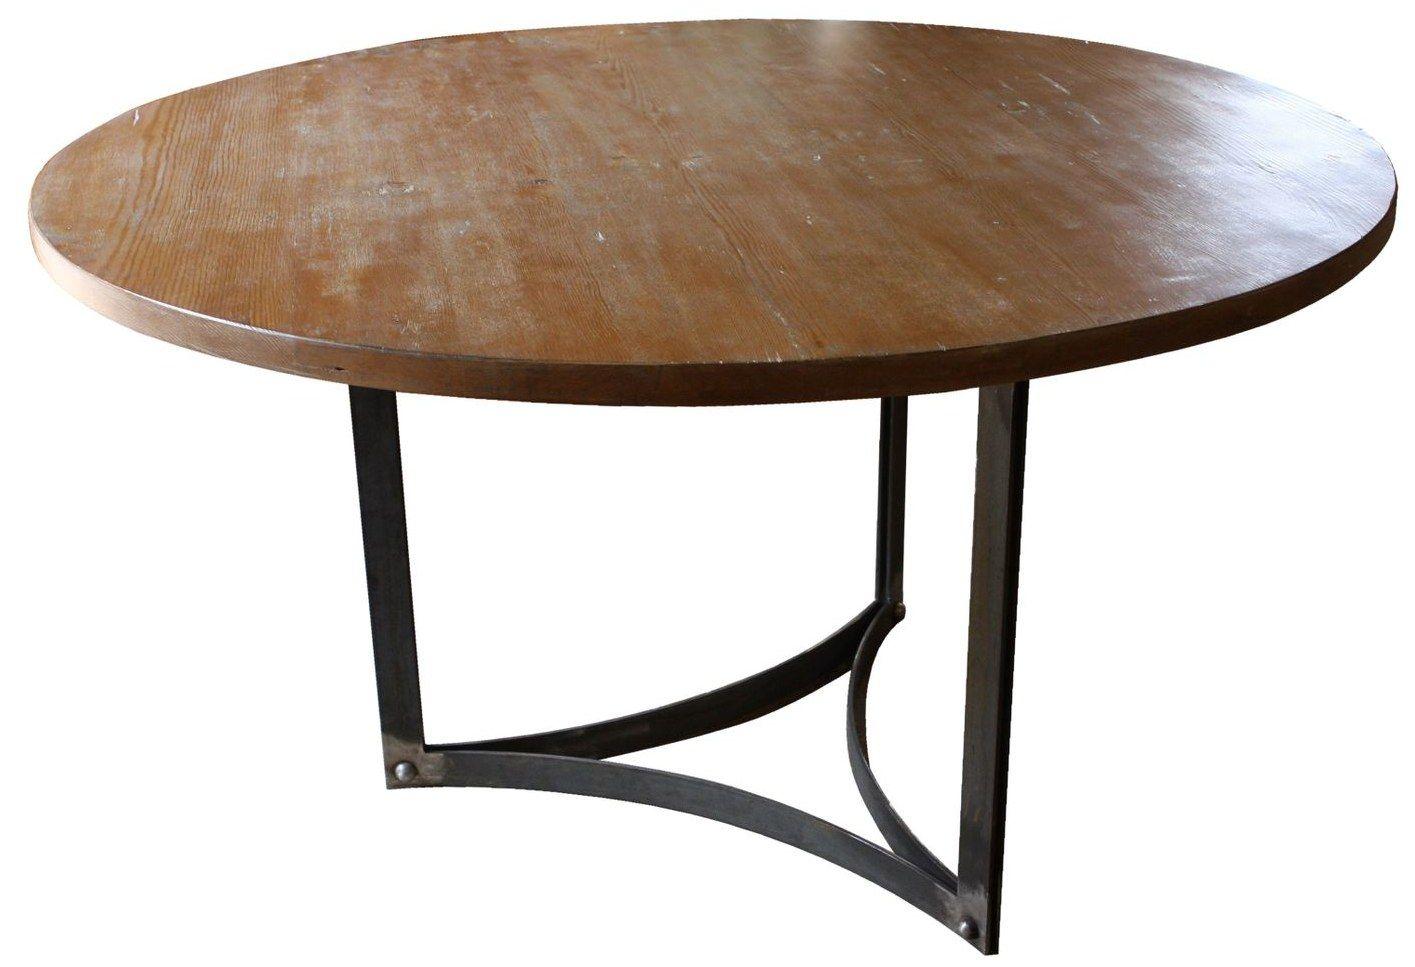 Modern Round Kitchen Table Inspiration Com Modern Round Kitchen Table Industrial Modern Dining Table Modern Dining Table